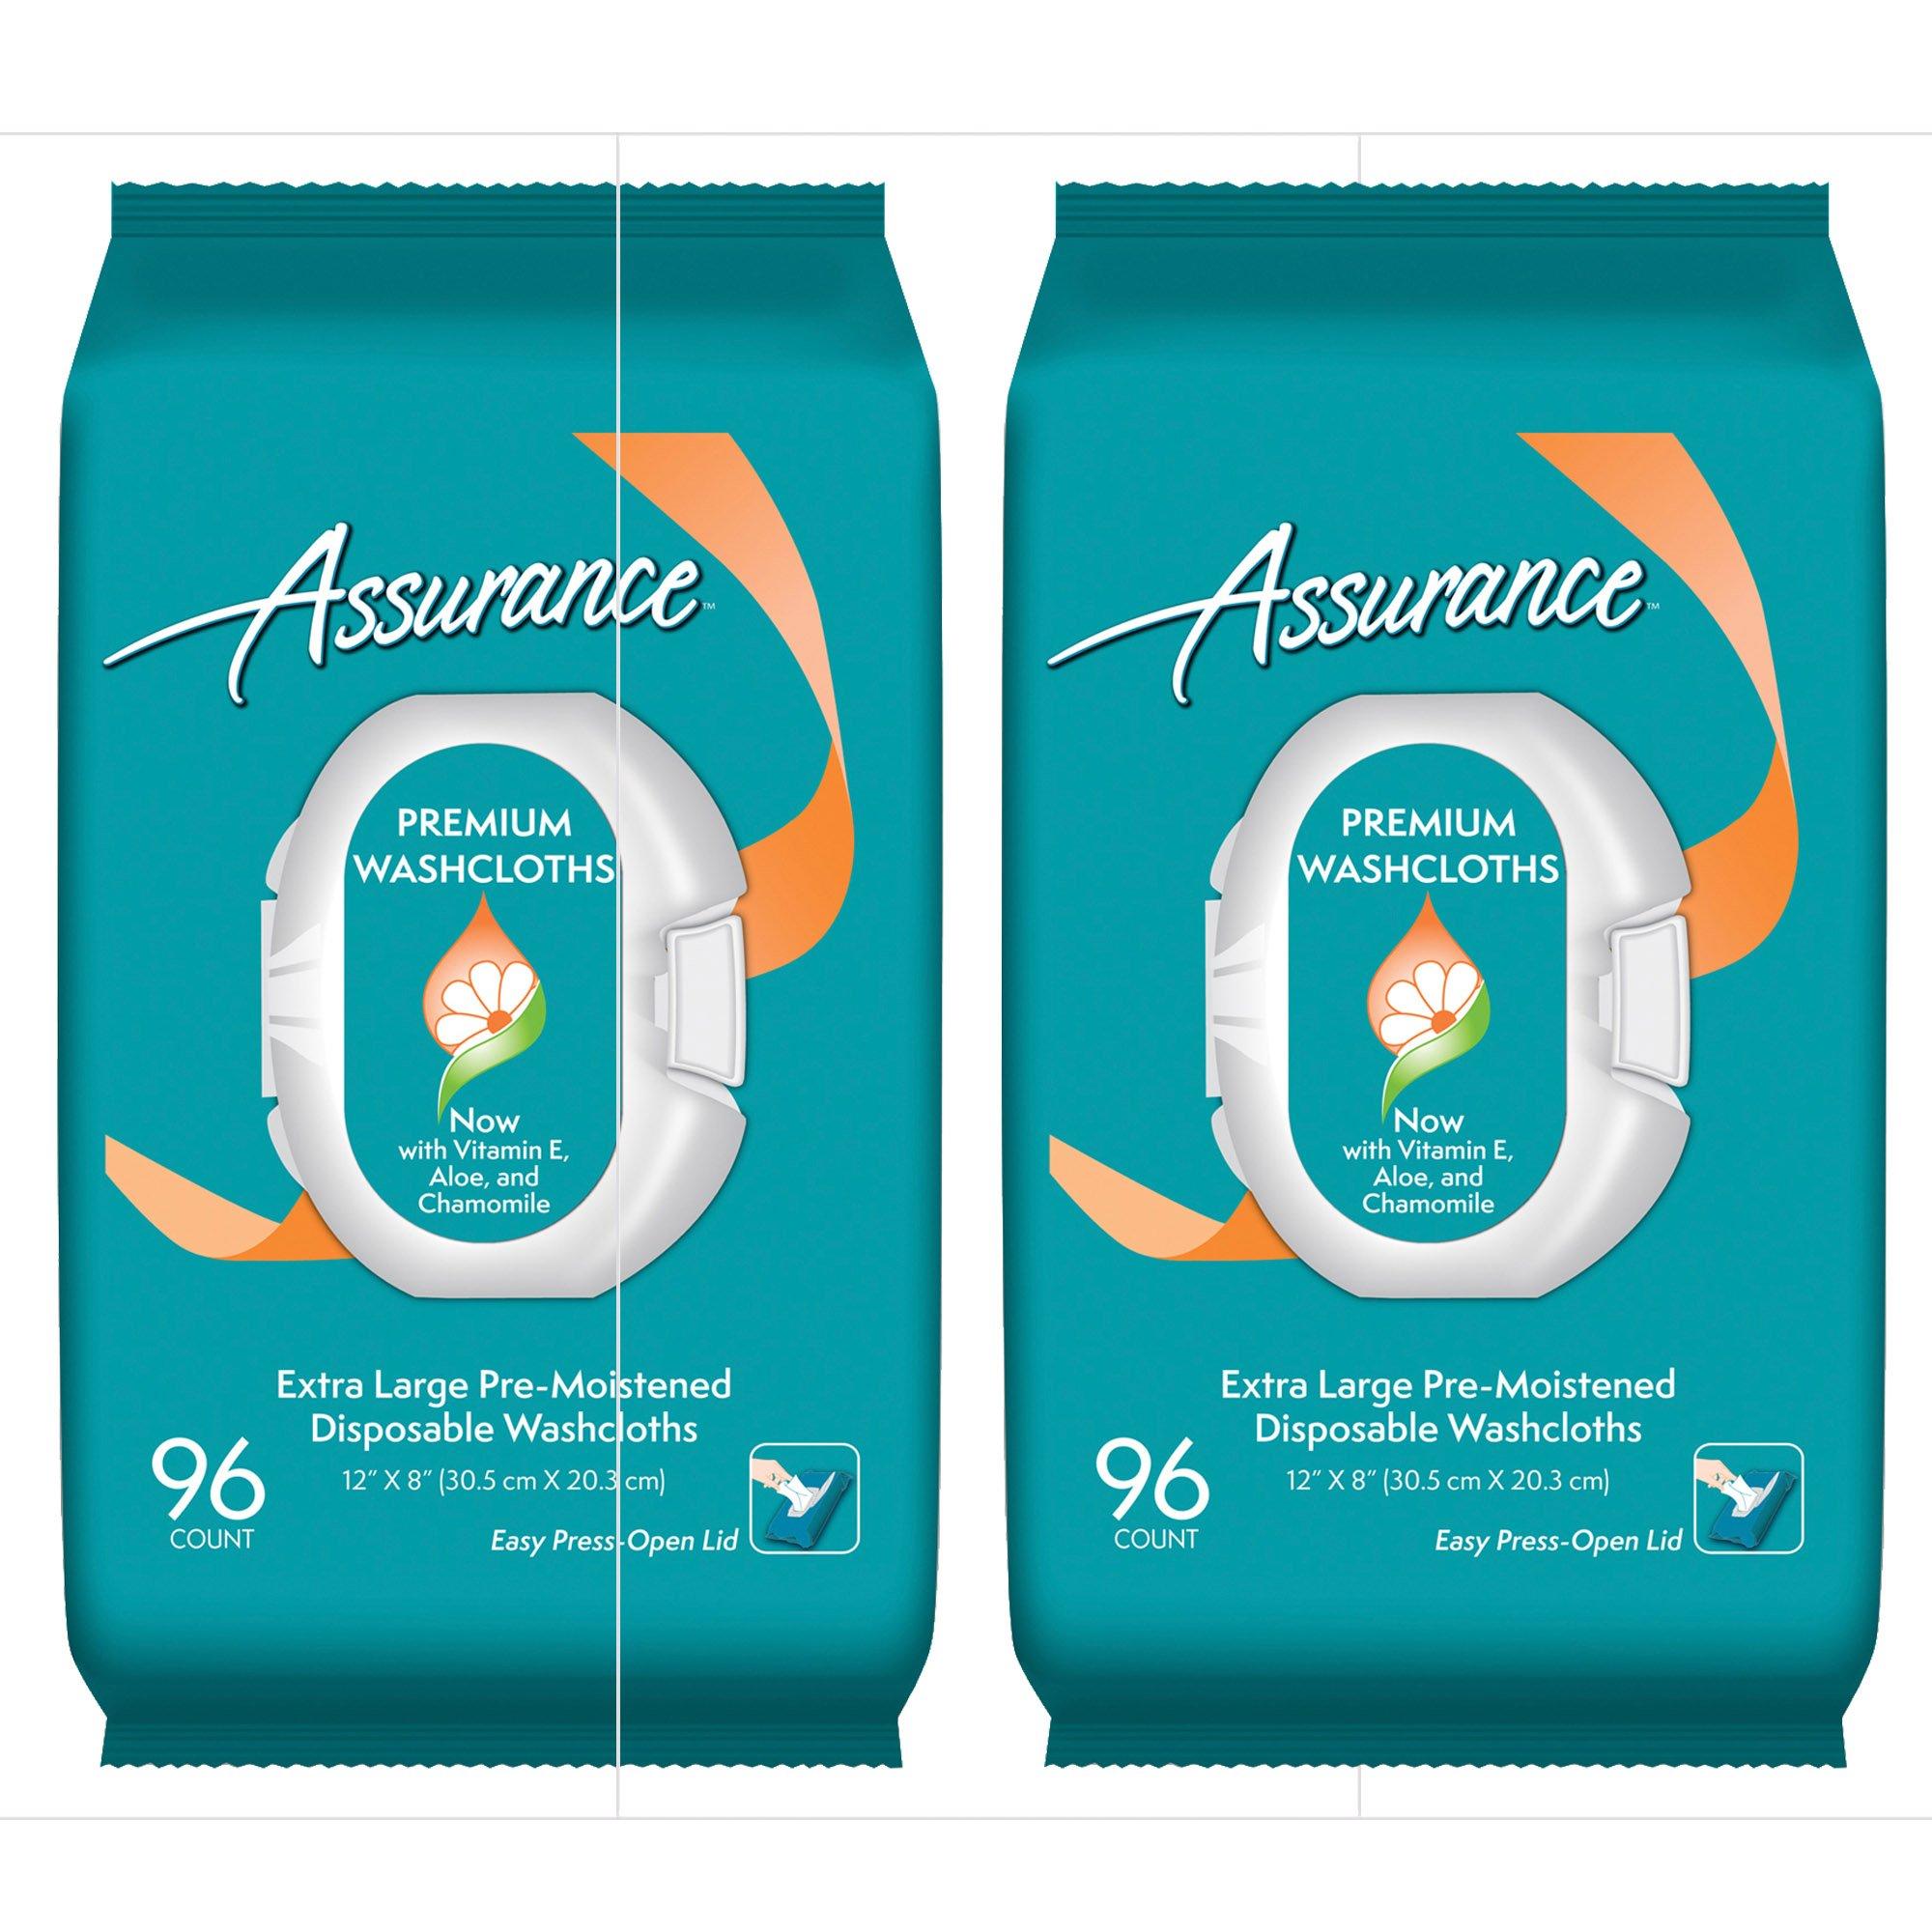 Assurance Premium Pre-moistened Disposable Washcloths, 96ct, 2-Pack